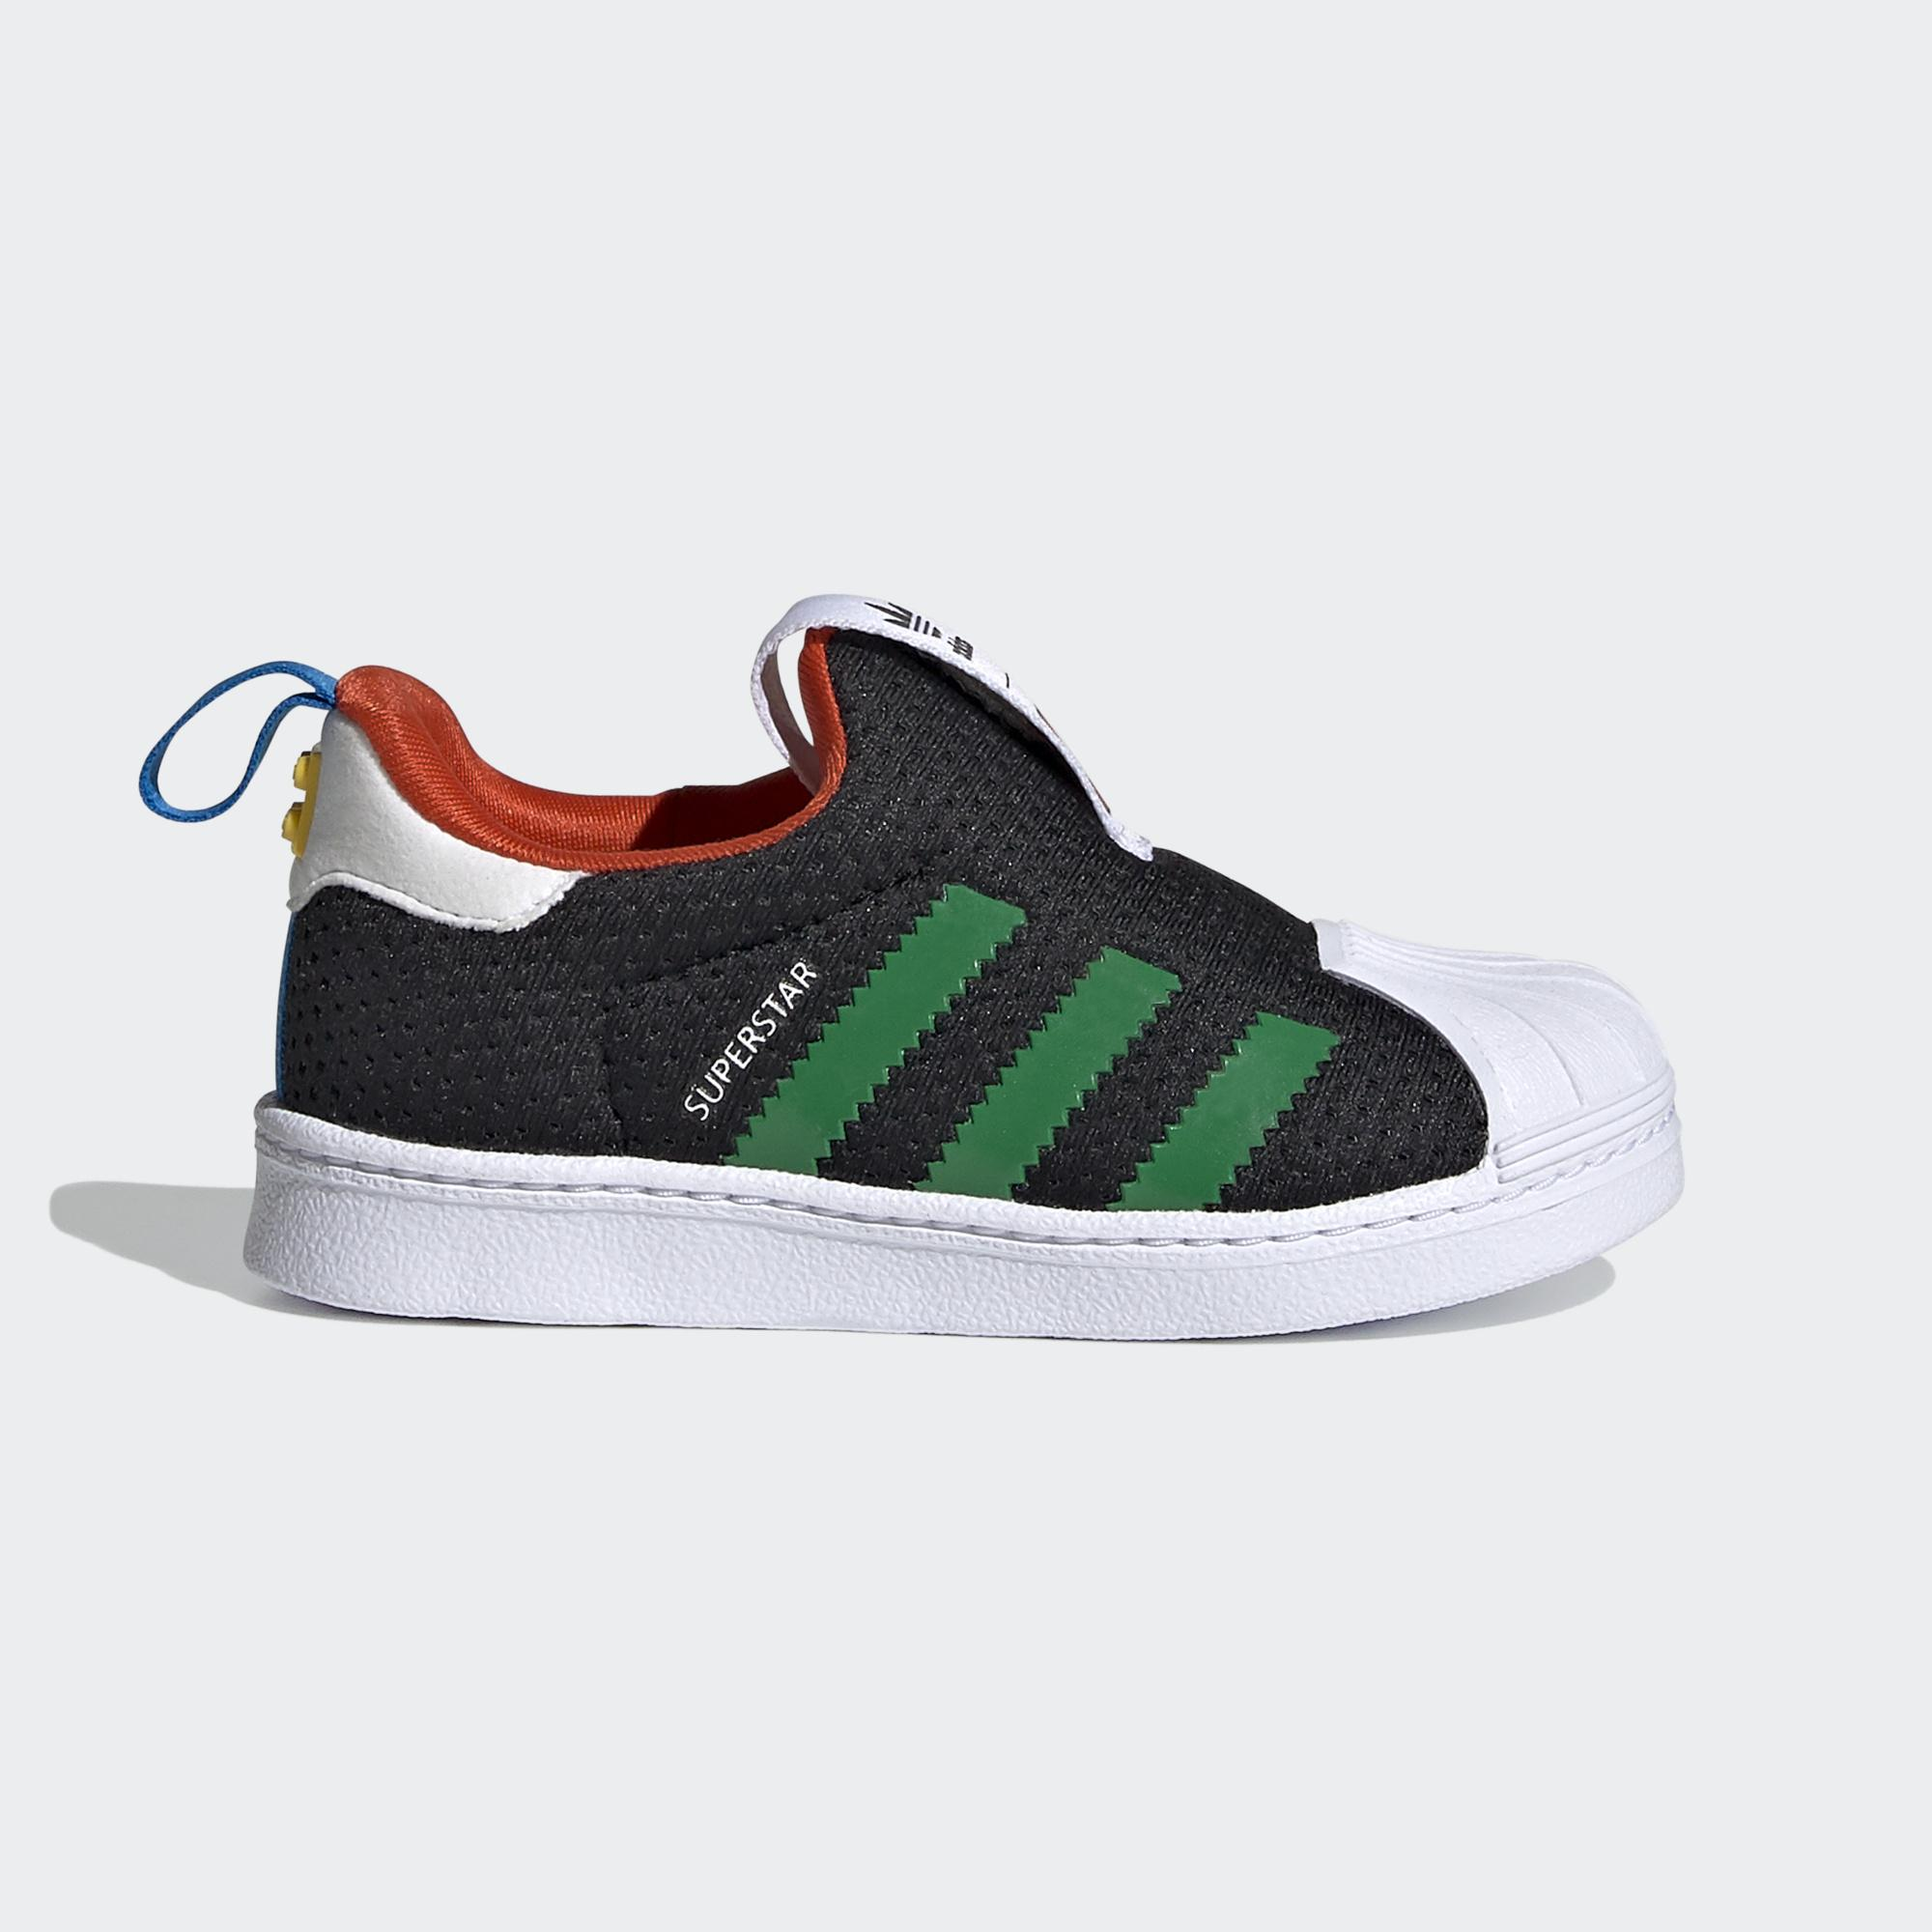 Superstar 360 x LEGO 經典鞋